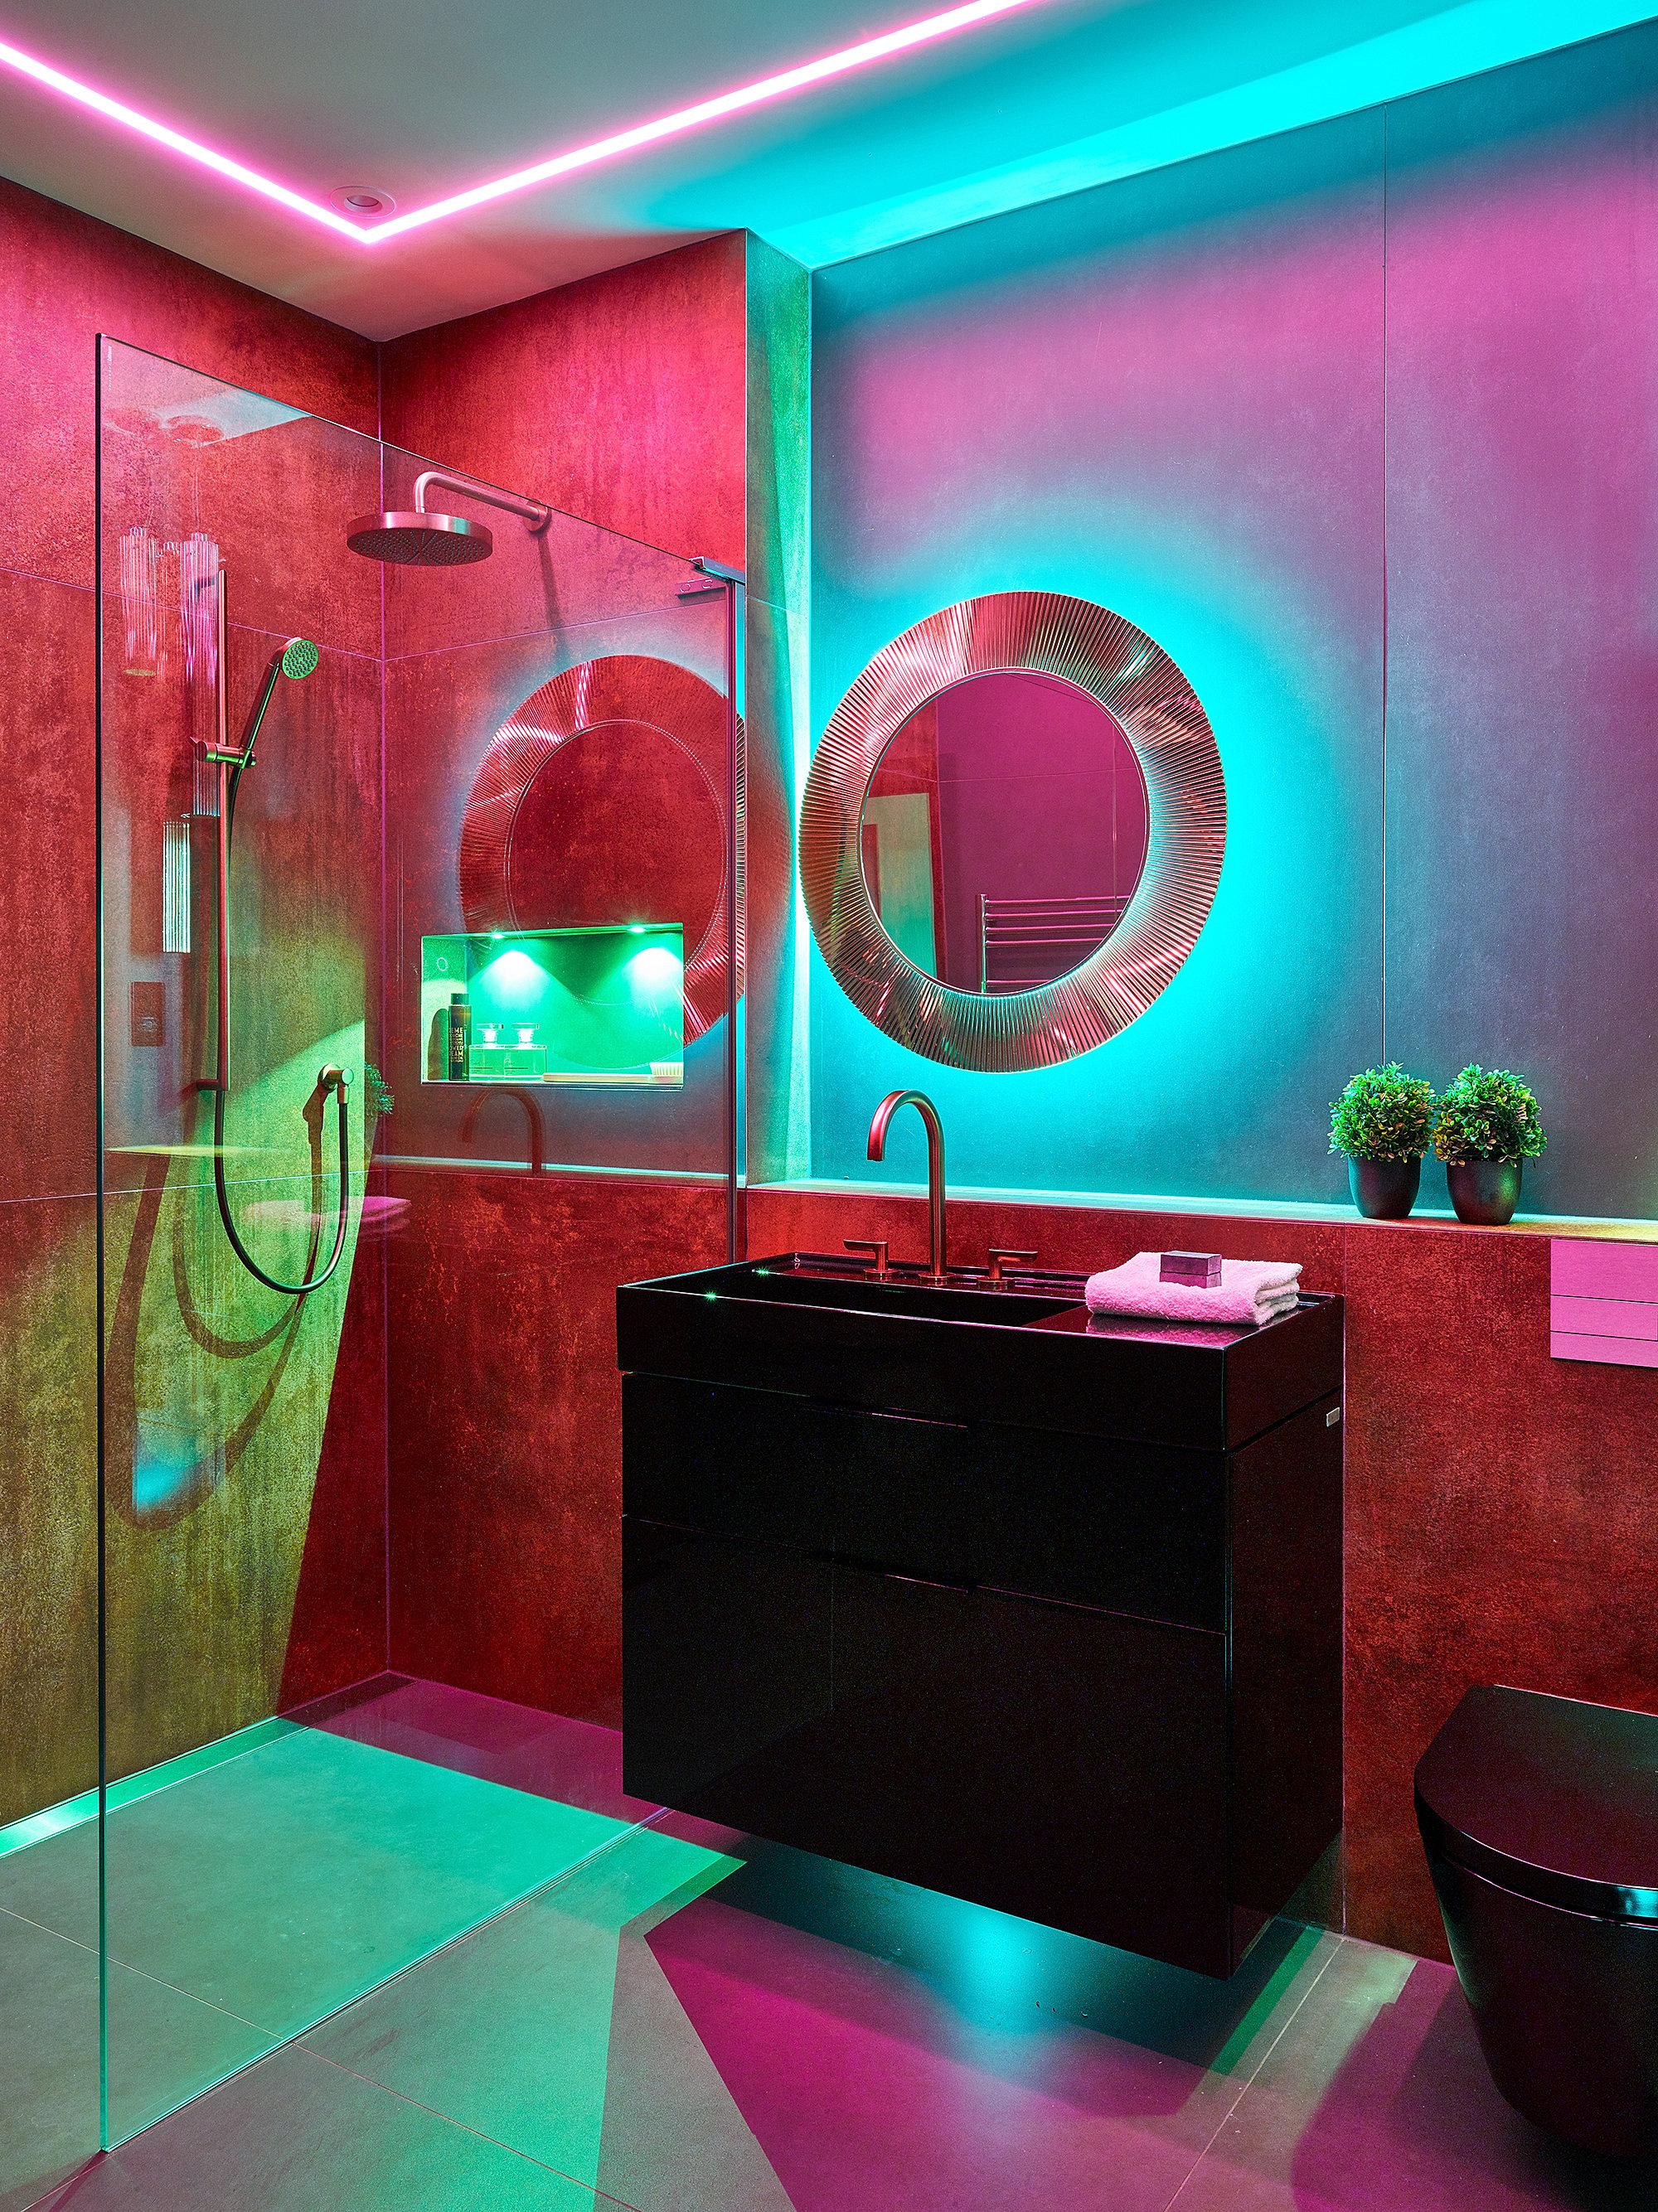 Nicholas Yarsley Photographer - Interiors & Architecture - London Uk